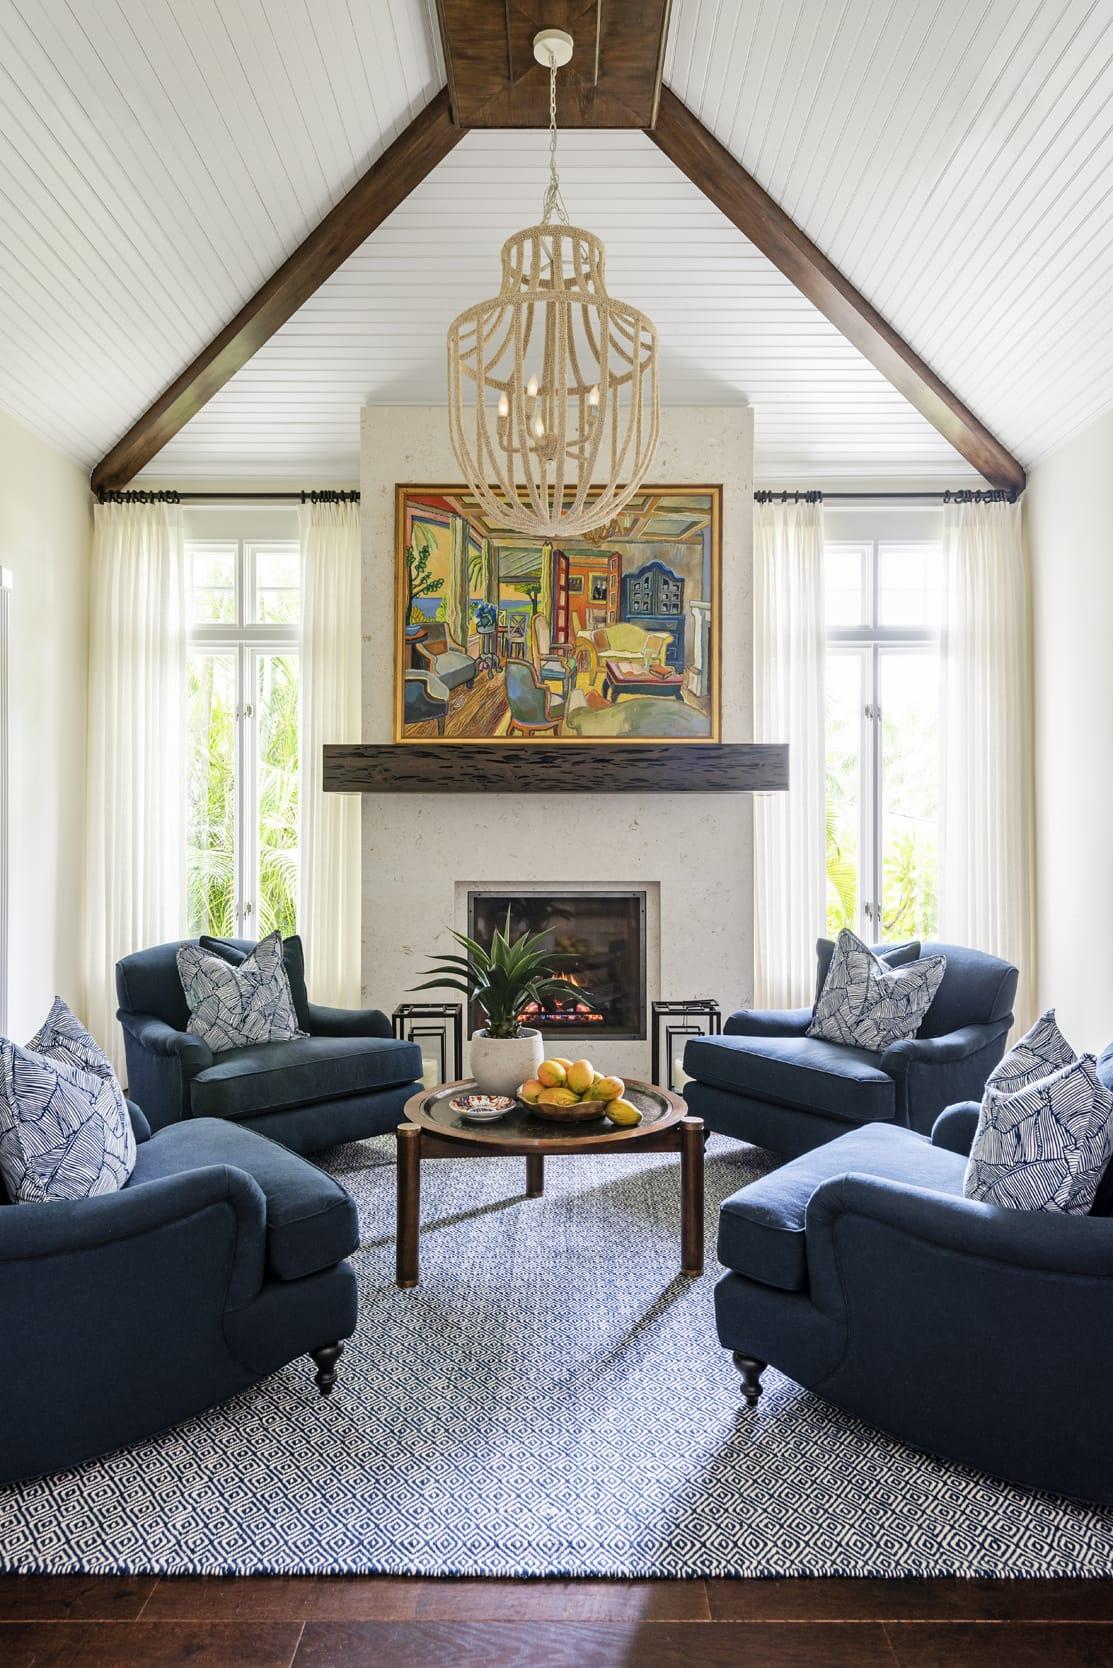 Jeffrey Fisher Home Dark Wood Navy Blue Arm Chairs White Blue Rug